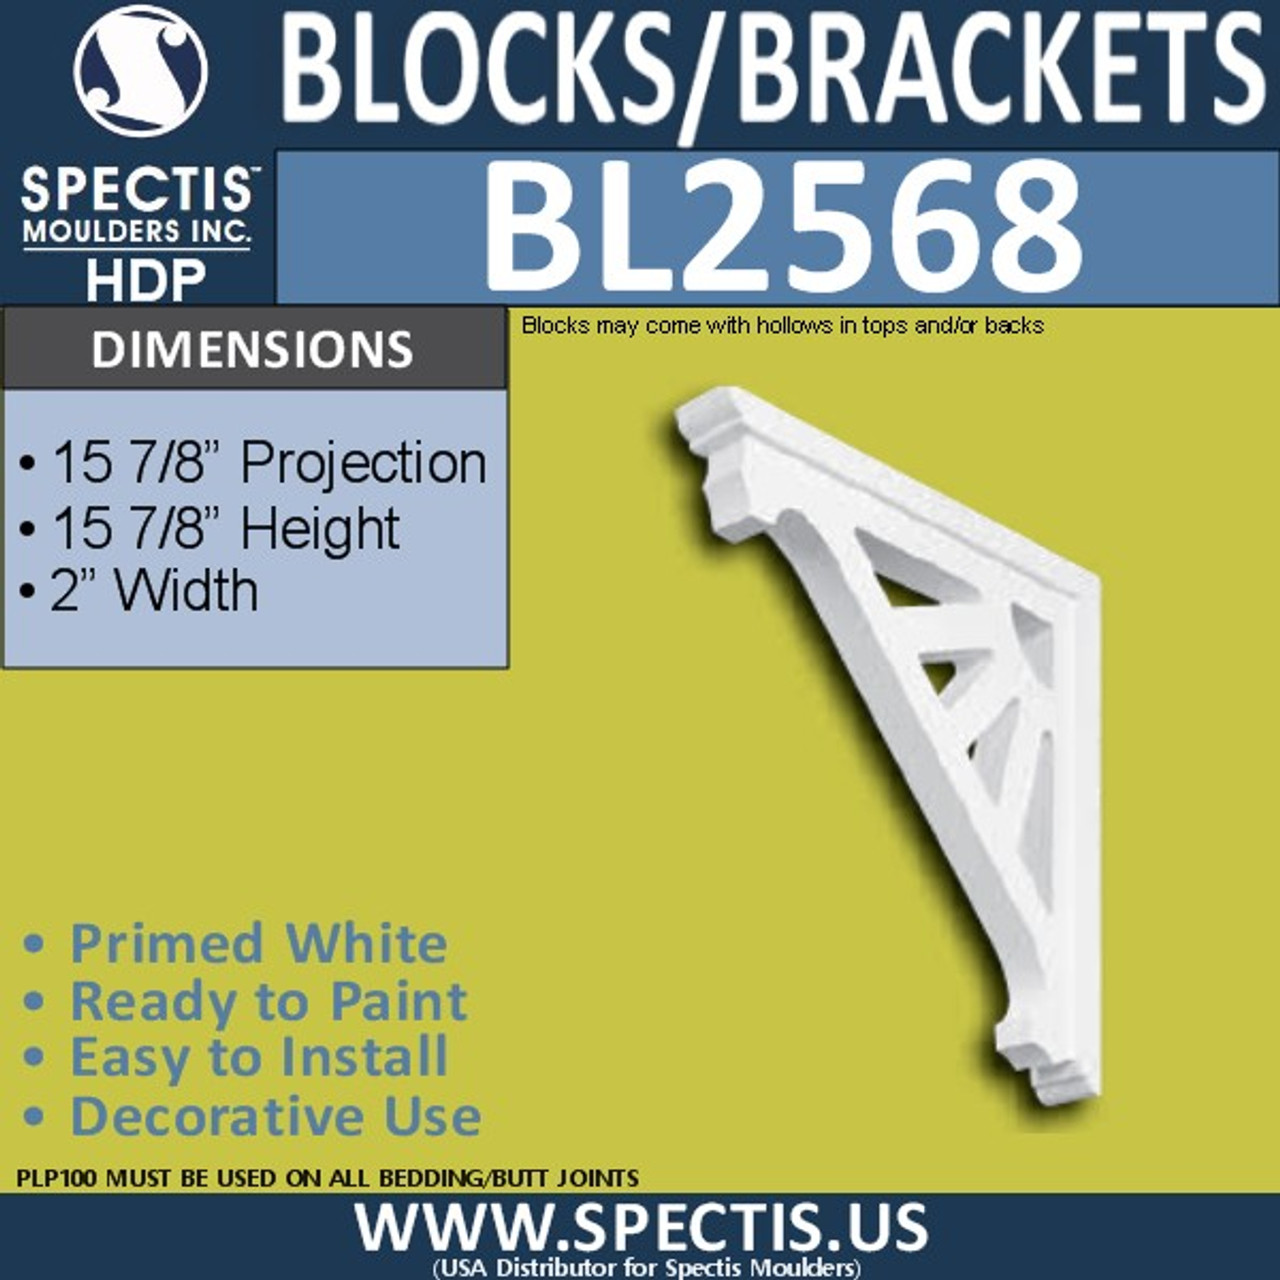 "BL2568 Eave Block or Bracket 2""W x 16""H x 16"" P"